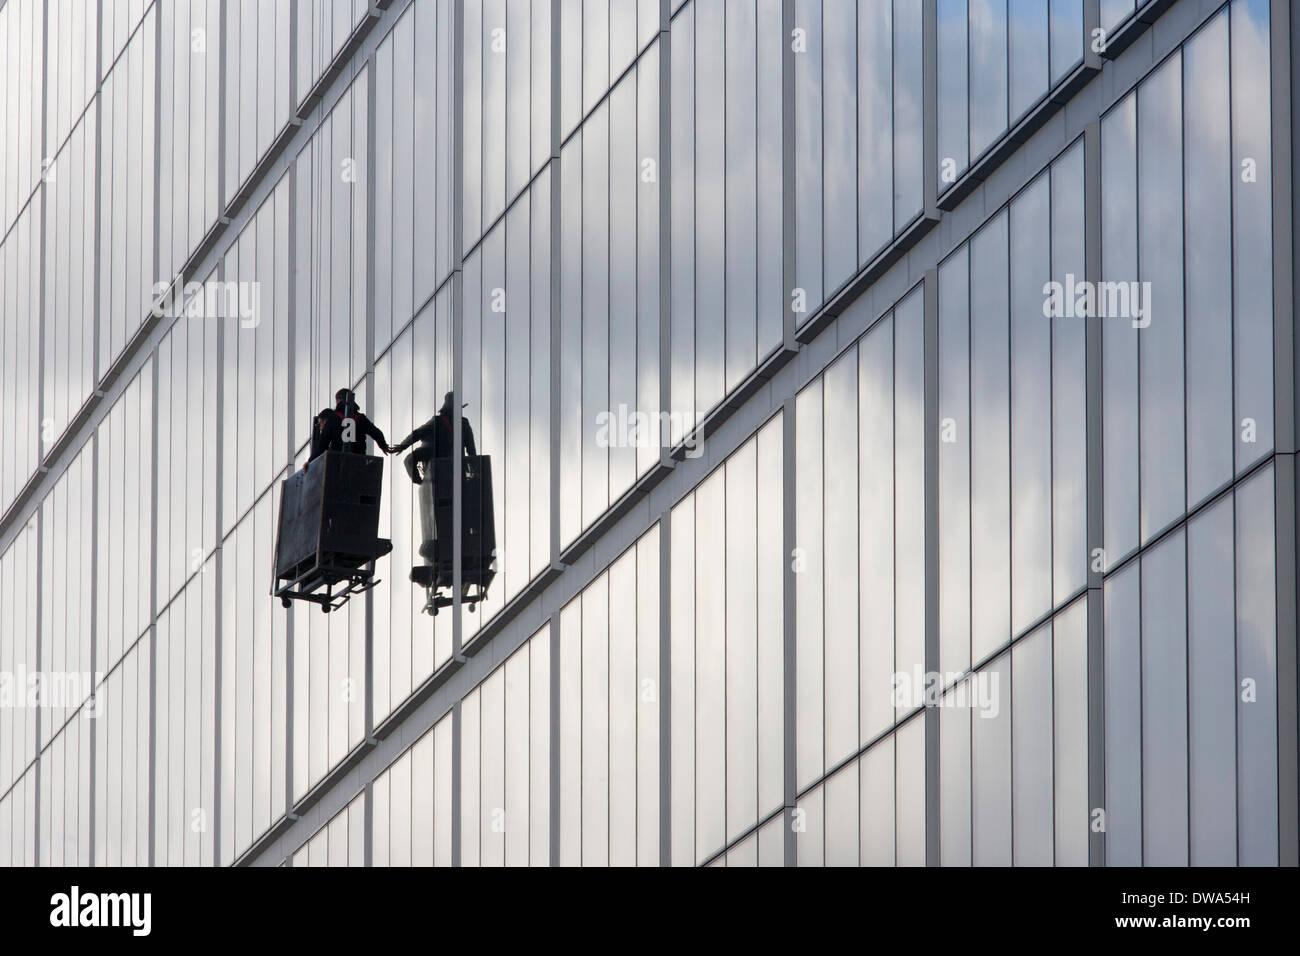 Offices In London Uk Stockfotos & Offices In London Uk Bilder ...